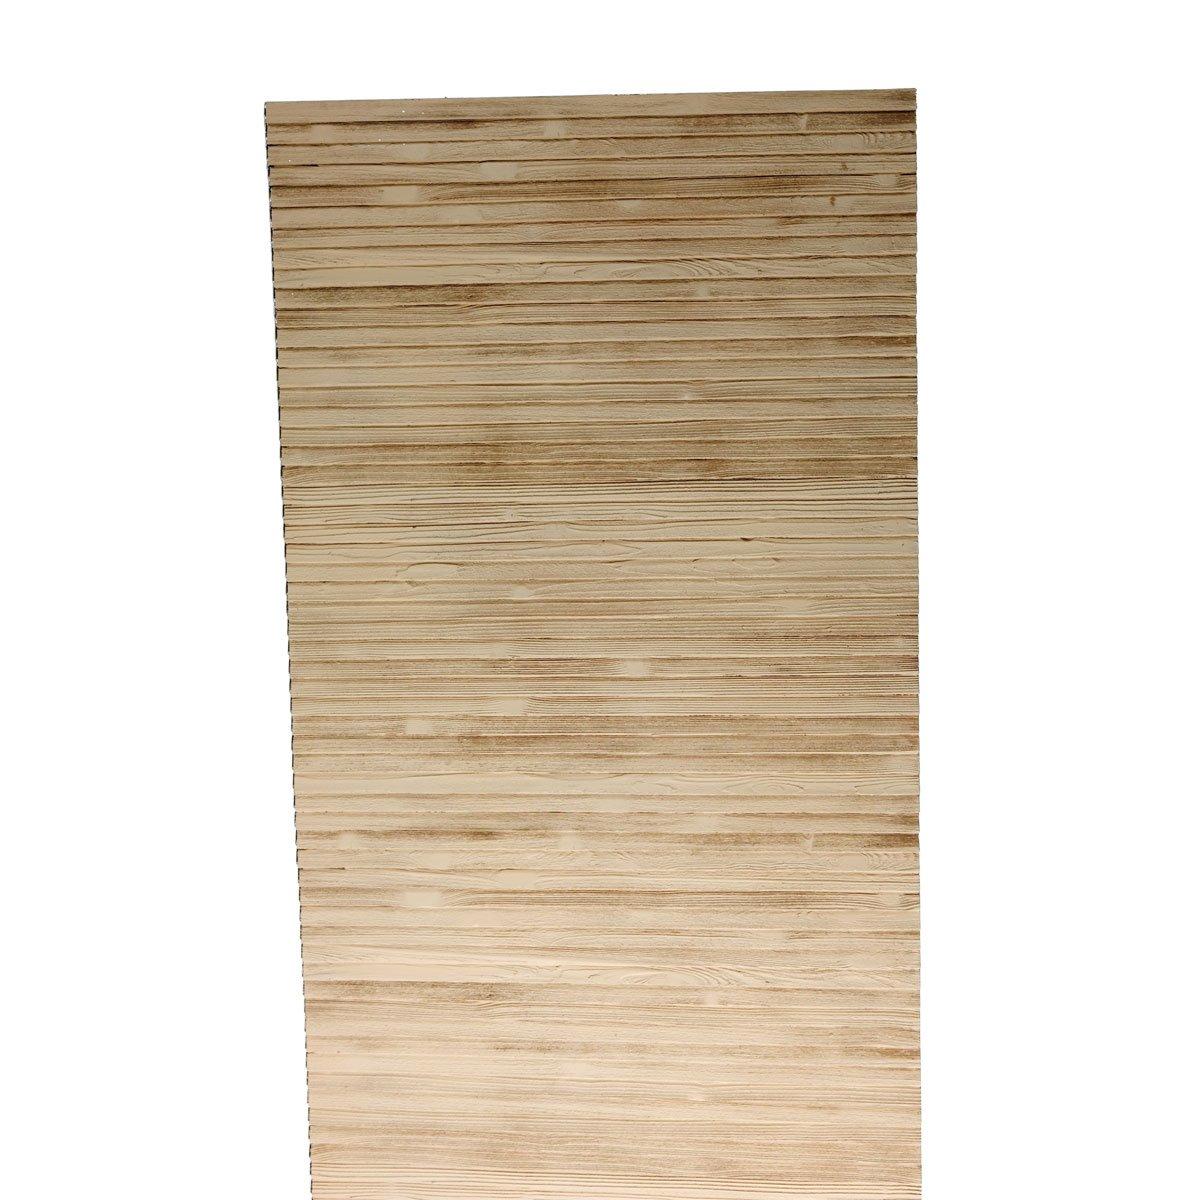 32''W x 144''H x 21/32''P Louvered Panel, Woodgrain Texture, Urethane (Per Pair)